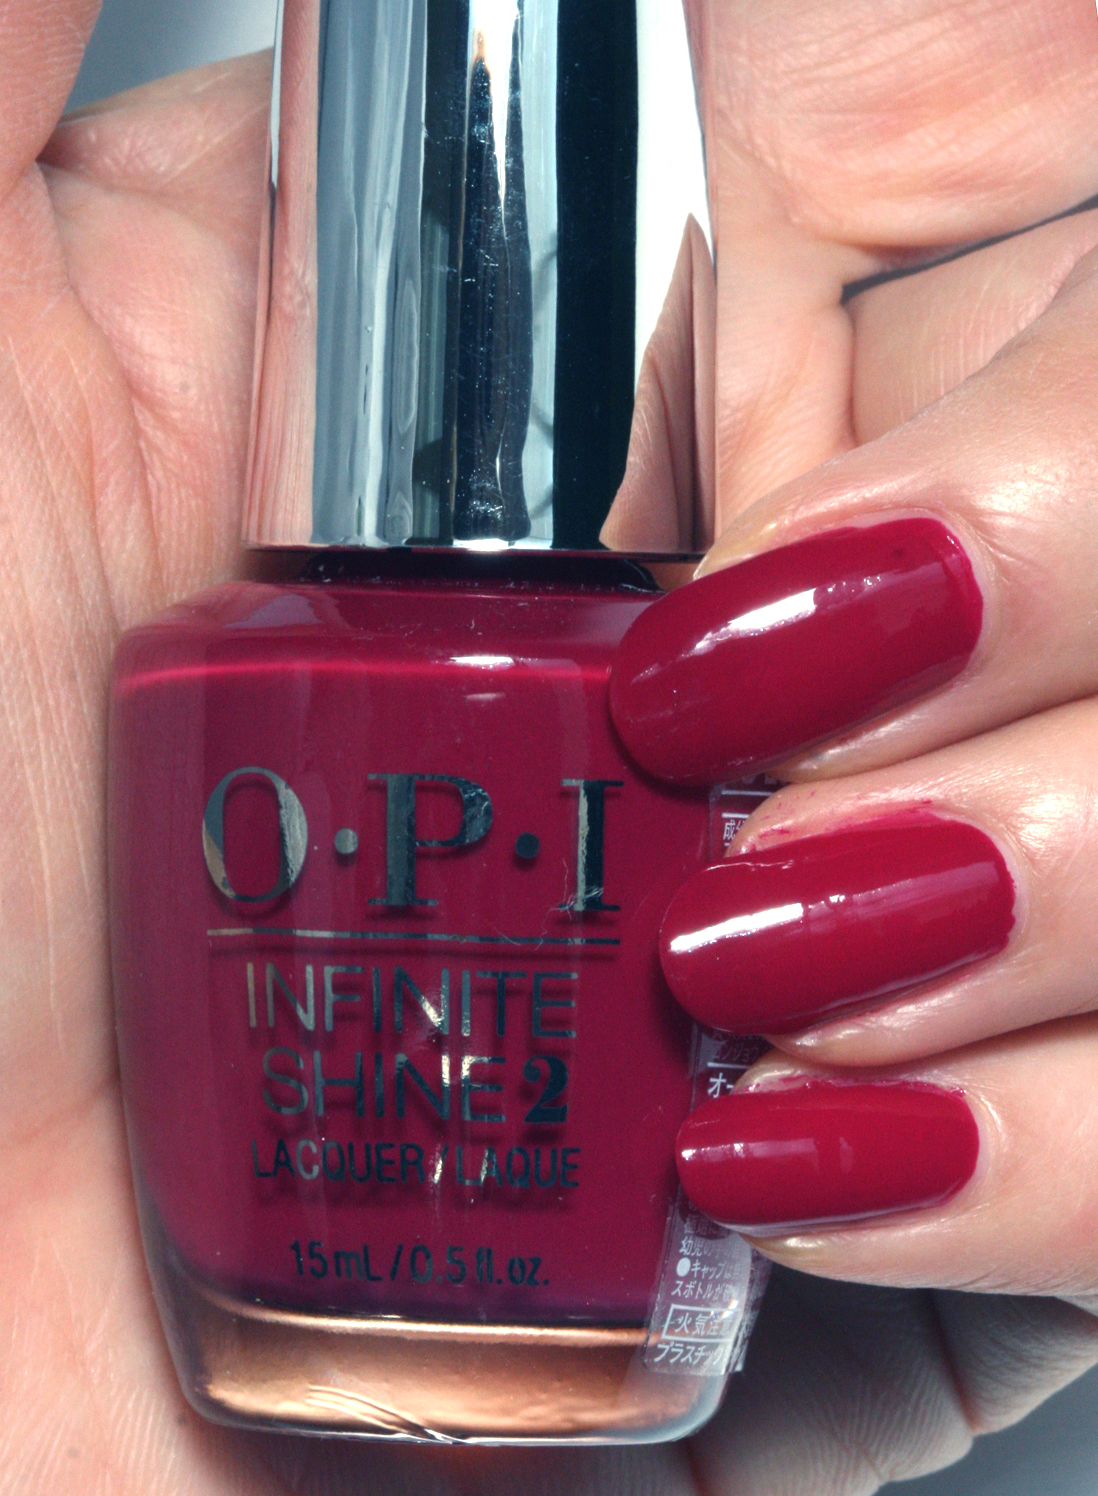 OPI INFINITE SHINE(インフィニット シャイン) IS-L60 Berry On Forever(ベリー オン フォーエバー)